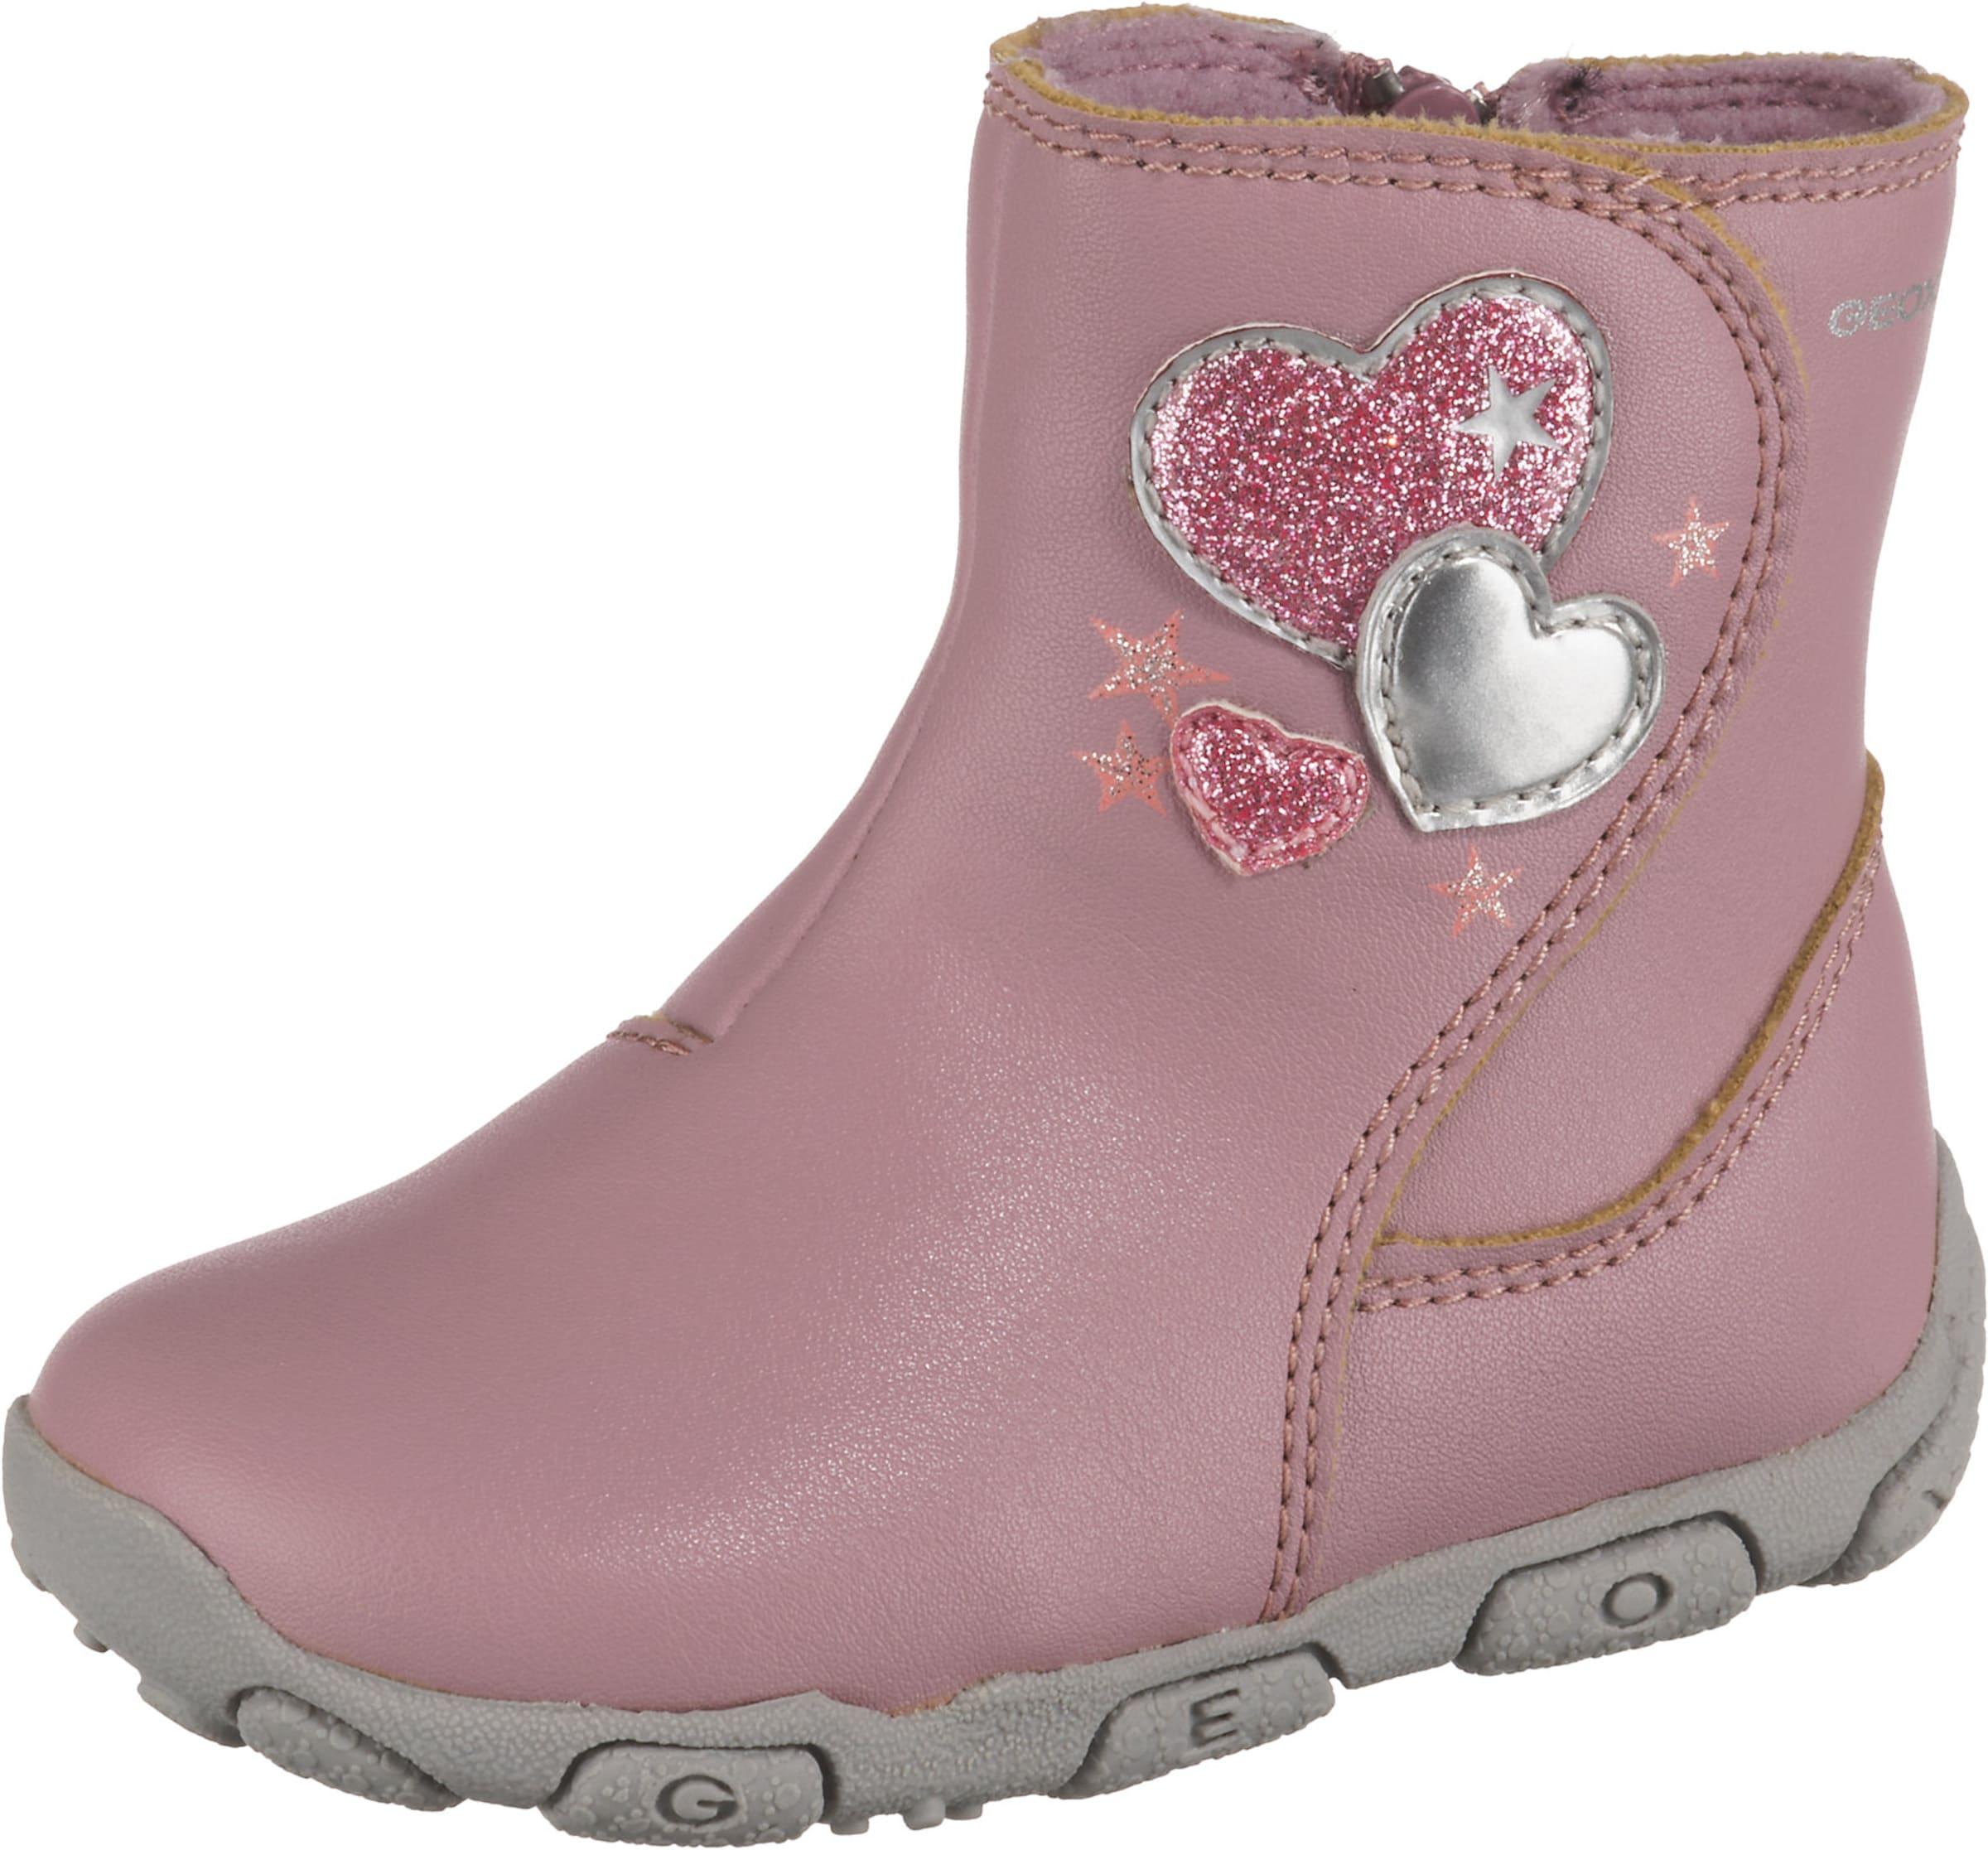 Kinder,  Mädchen,  Kinder Geox Schuhe 'First Step' rosa | 08054730054378